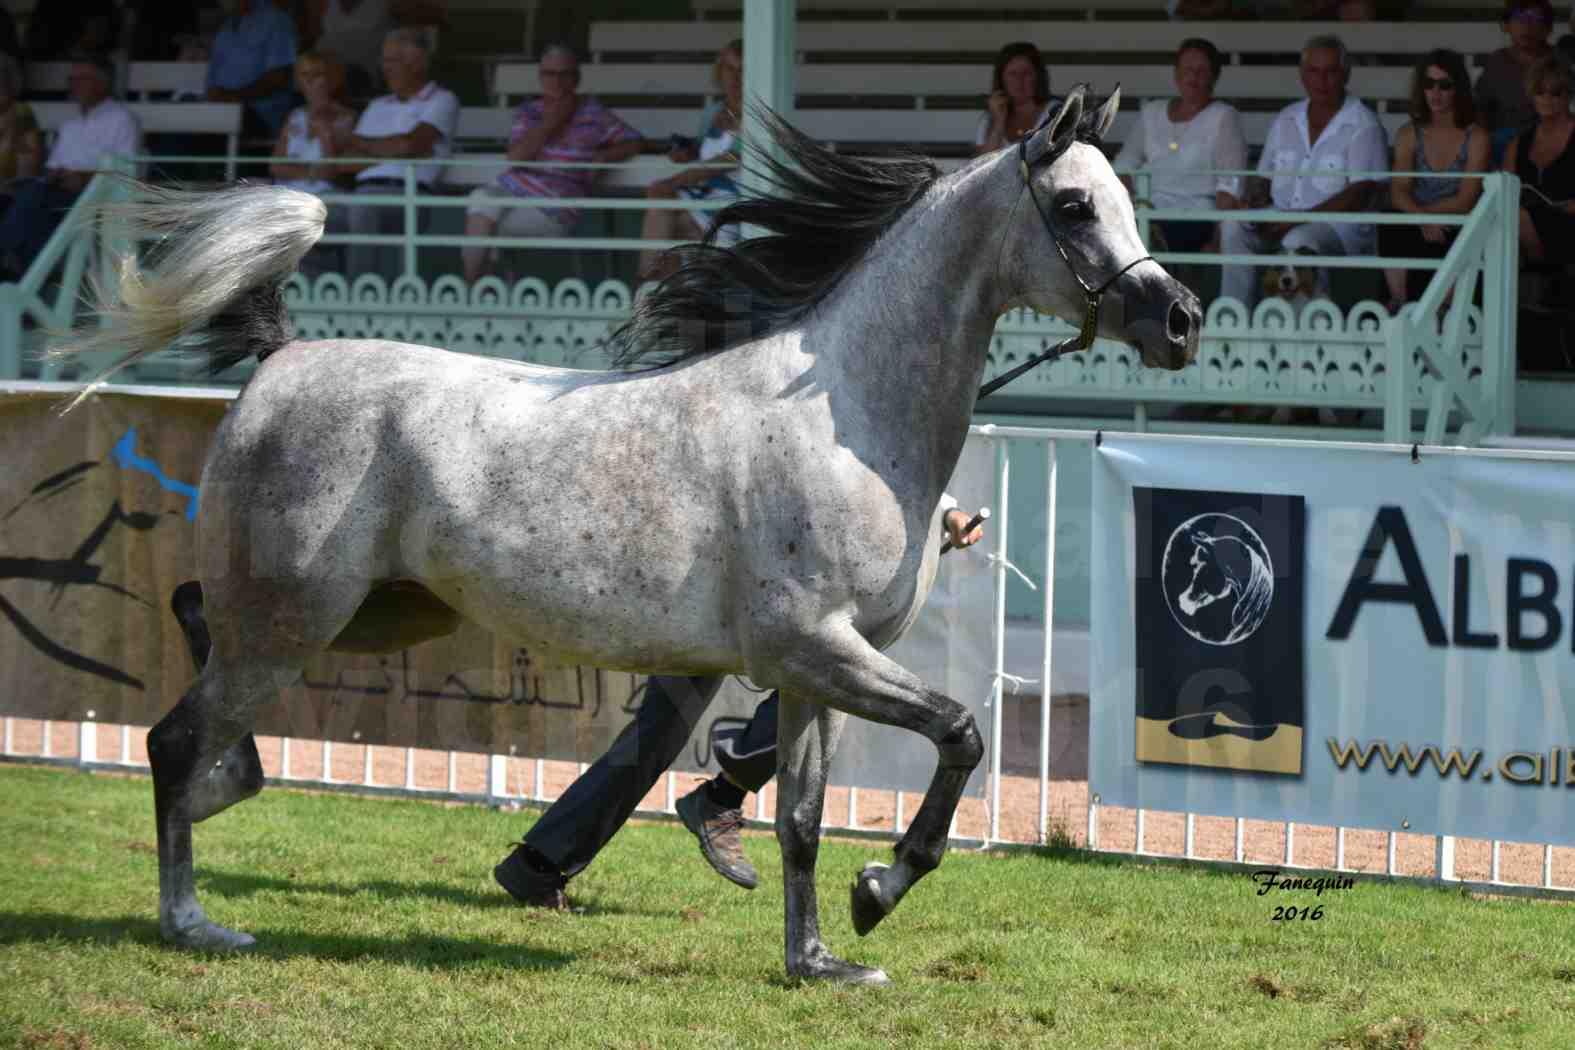 International Arabian Horse Show B de VICHY 2016 - ISABELLA - Notre Sélection - 04